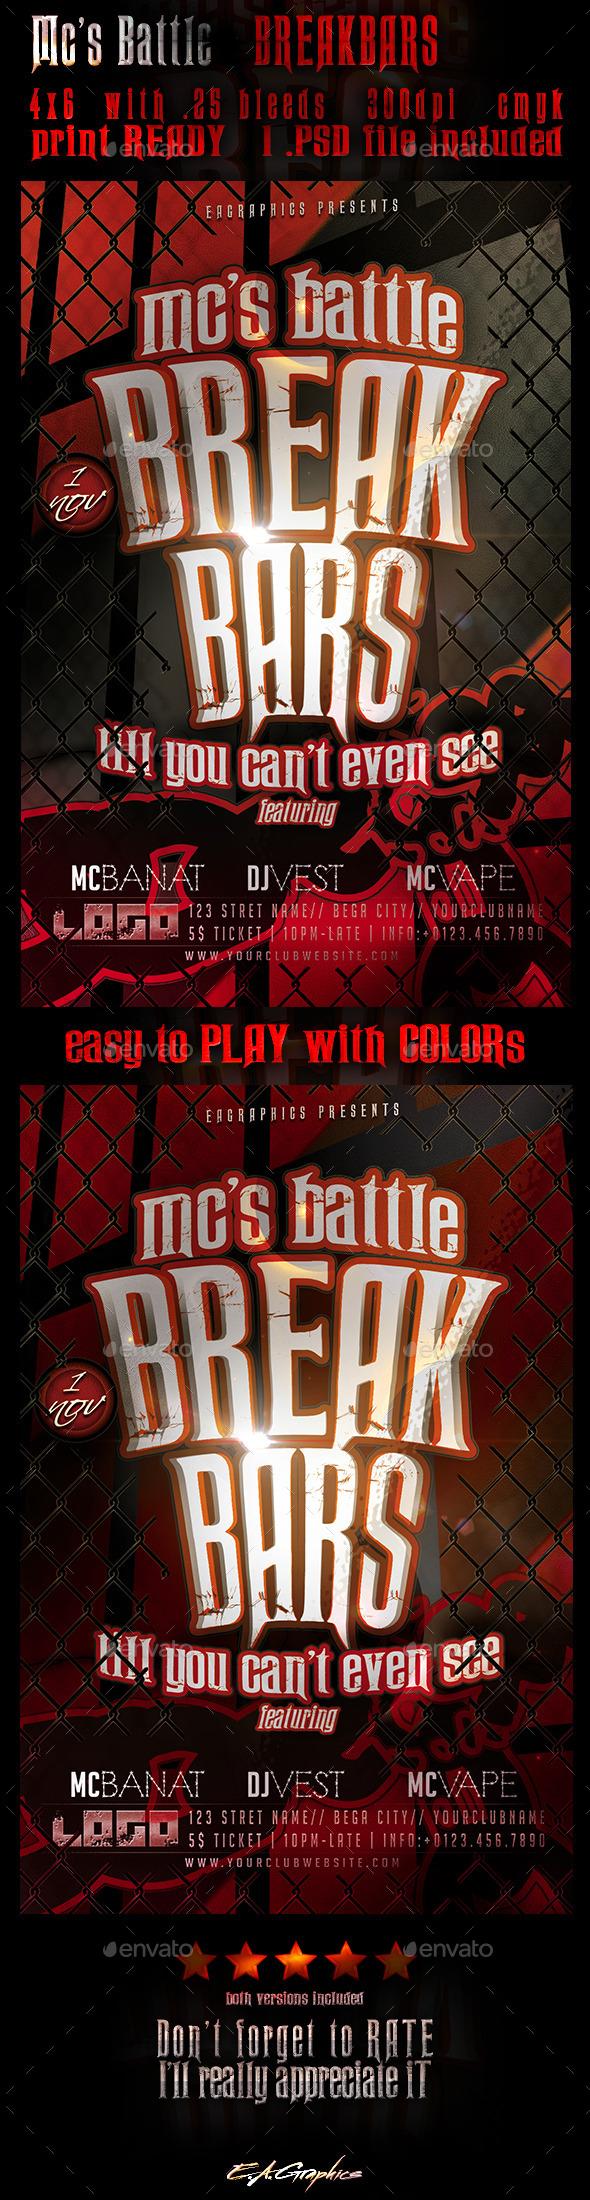 Mc's Battle - BreakBars - Clubs & Parties Events